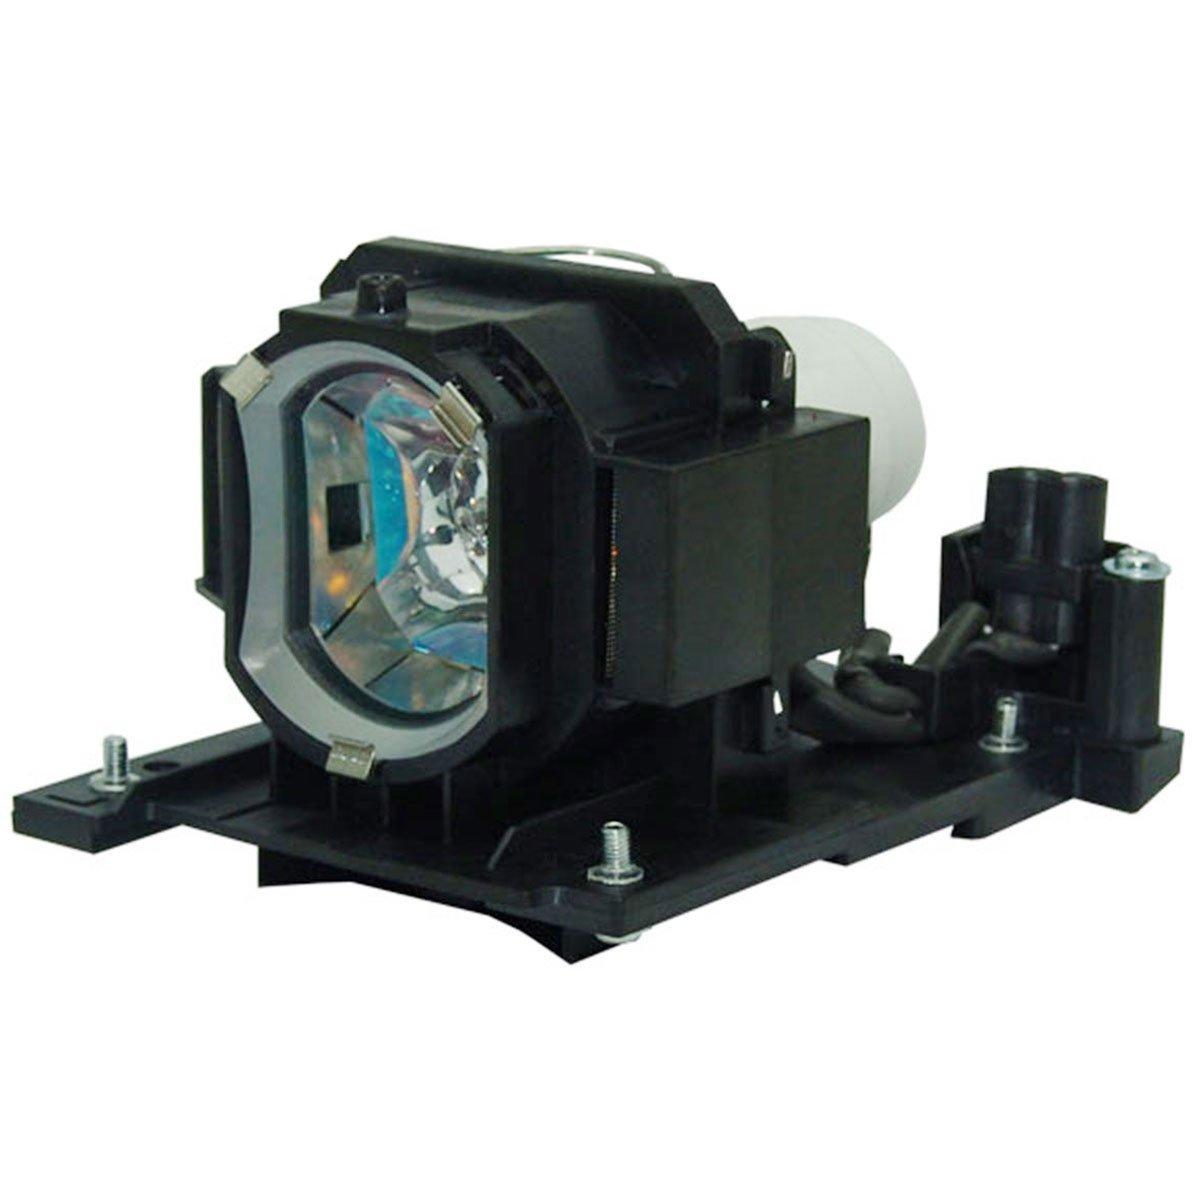 Ceybo WX36 ランプ/電球交換 ハウジング付き 3M プロジェクター用 B07PJN3Z2D